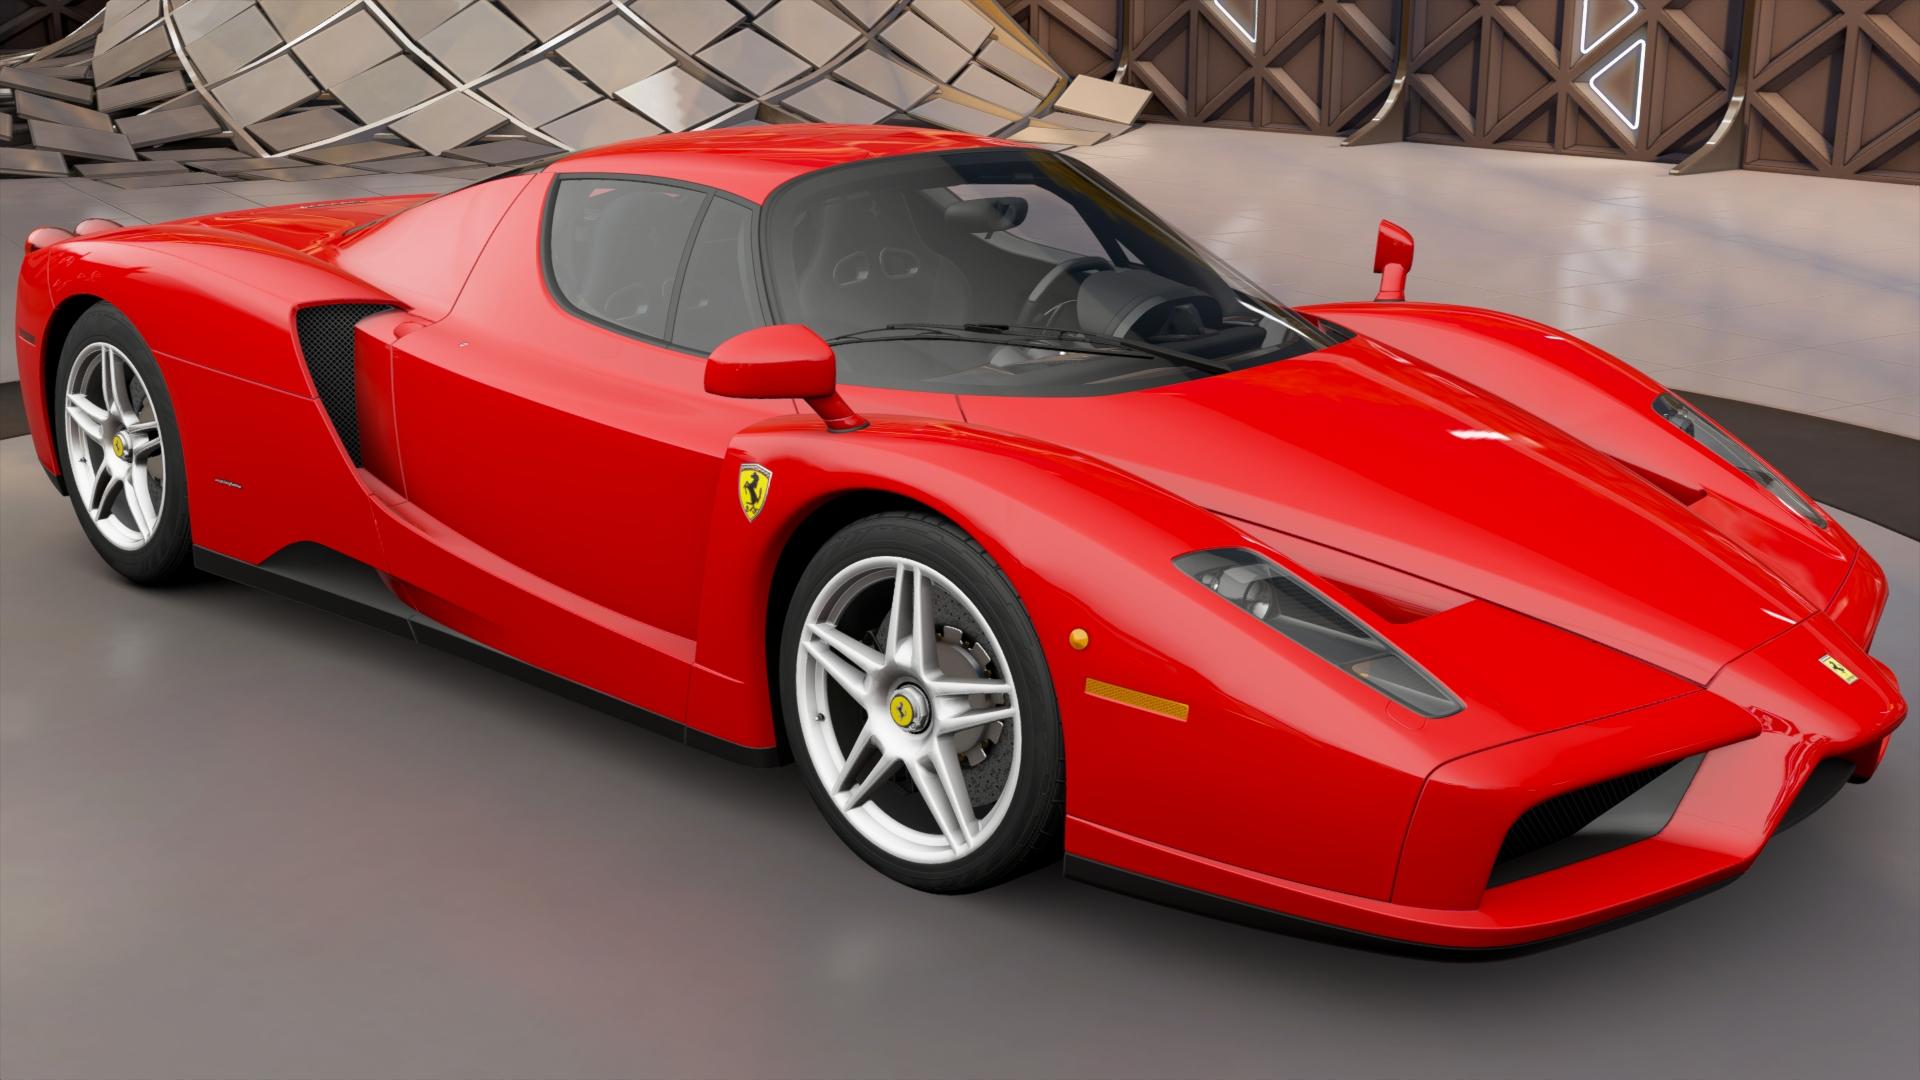 Ferrari Enzo Ferrari Forza Motorsport Wiki Fandom Powered By Wikia